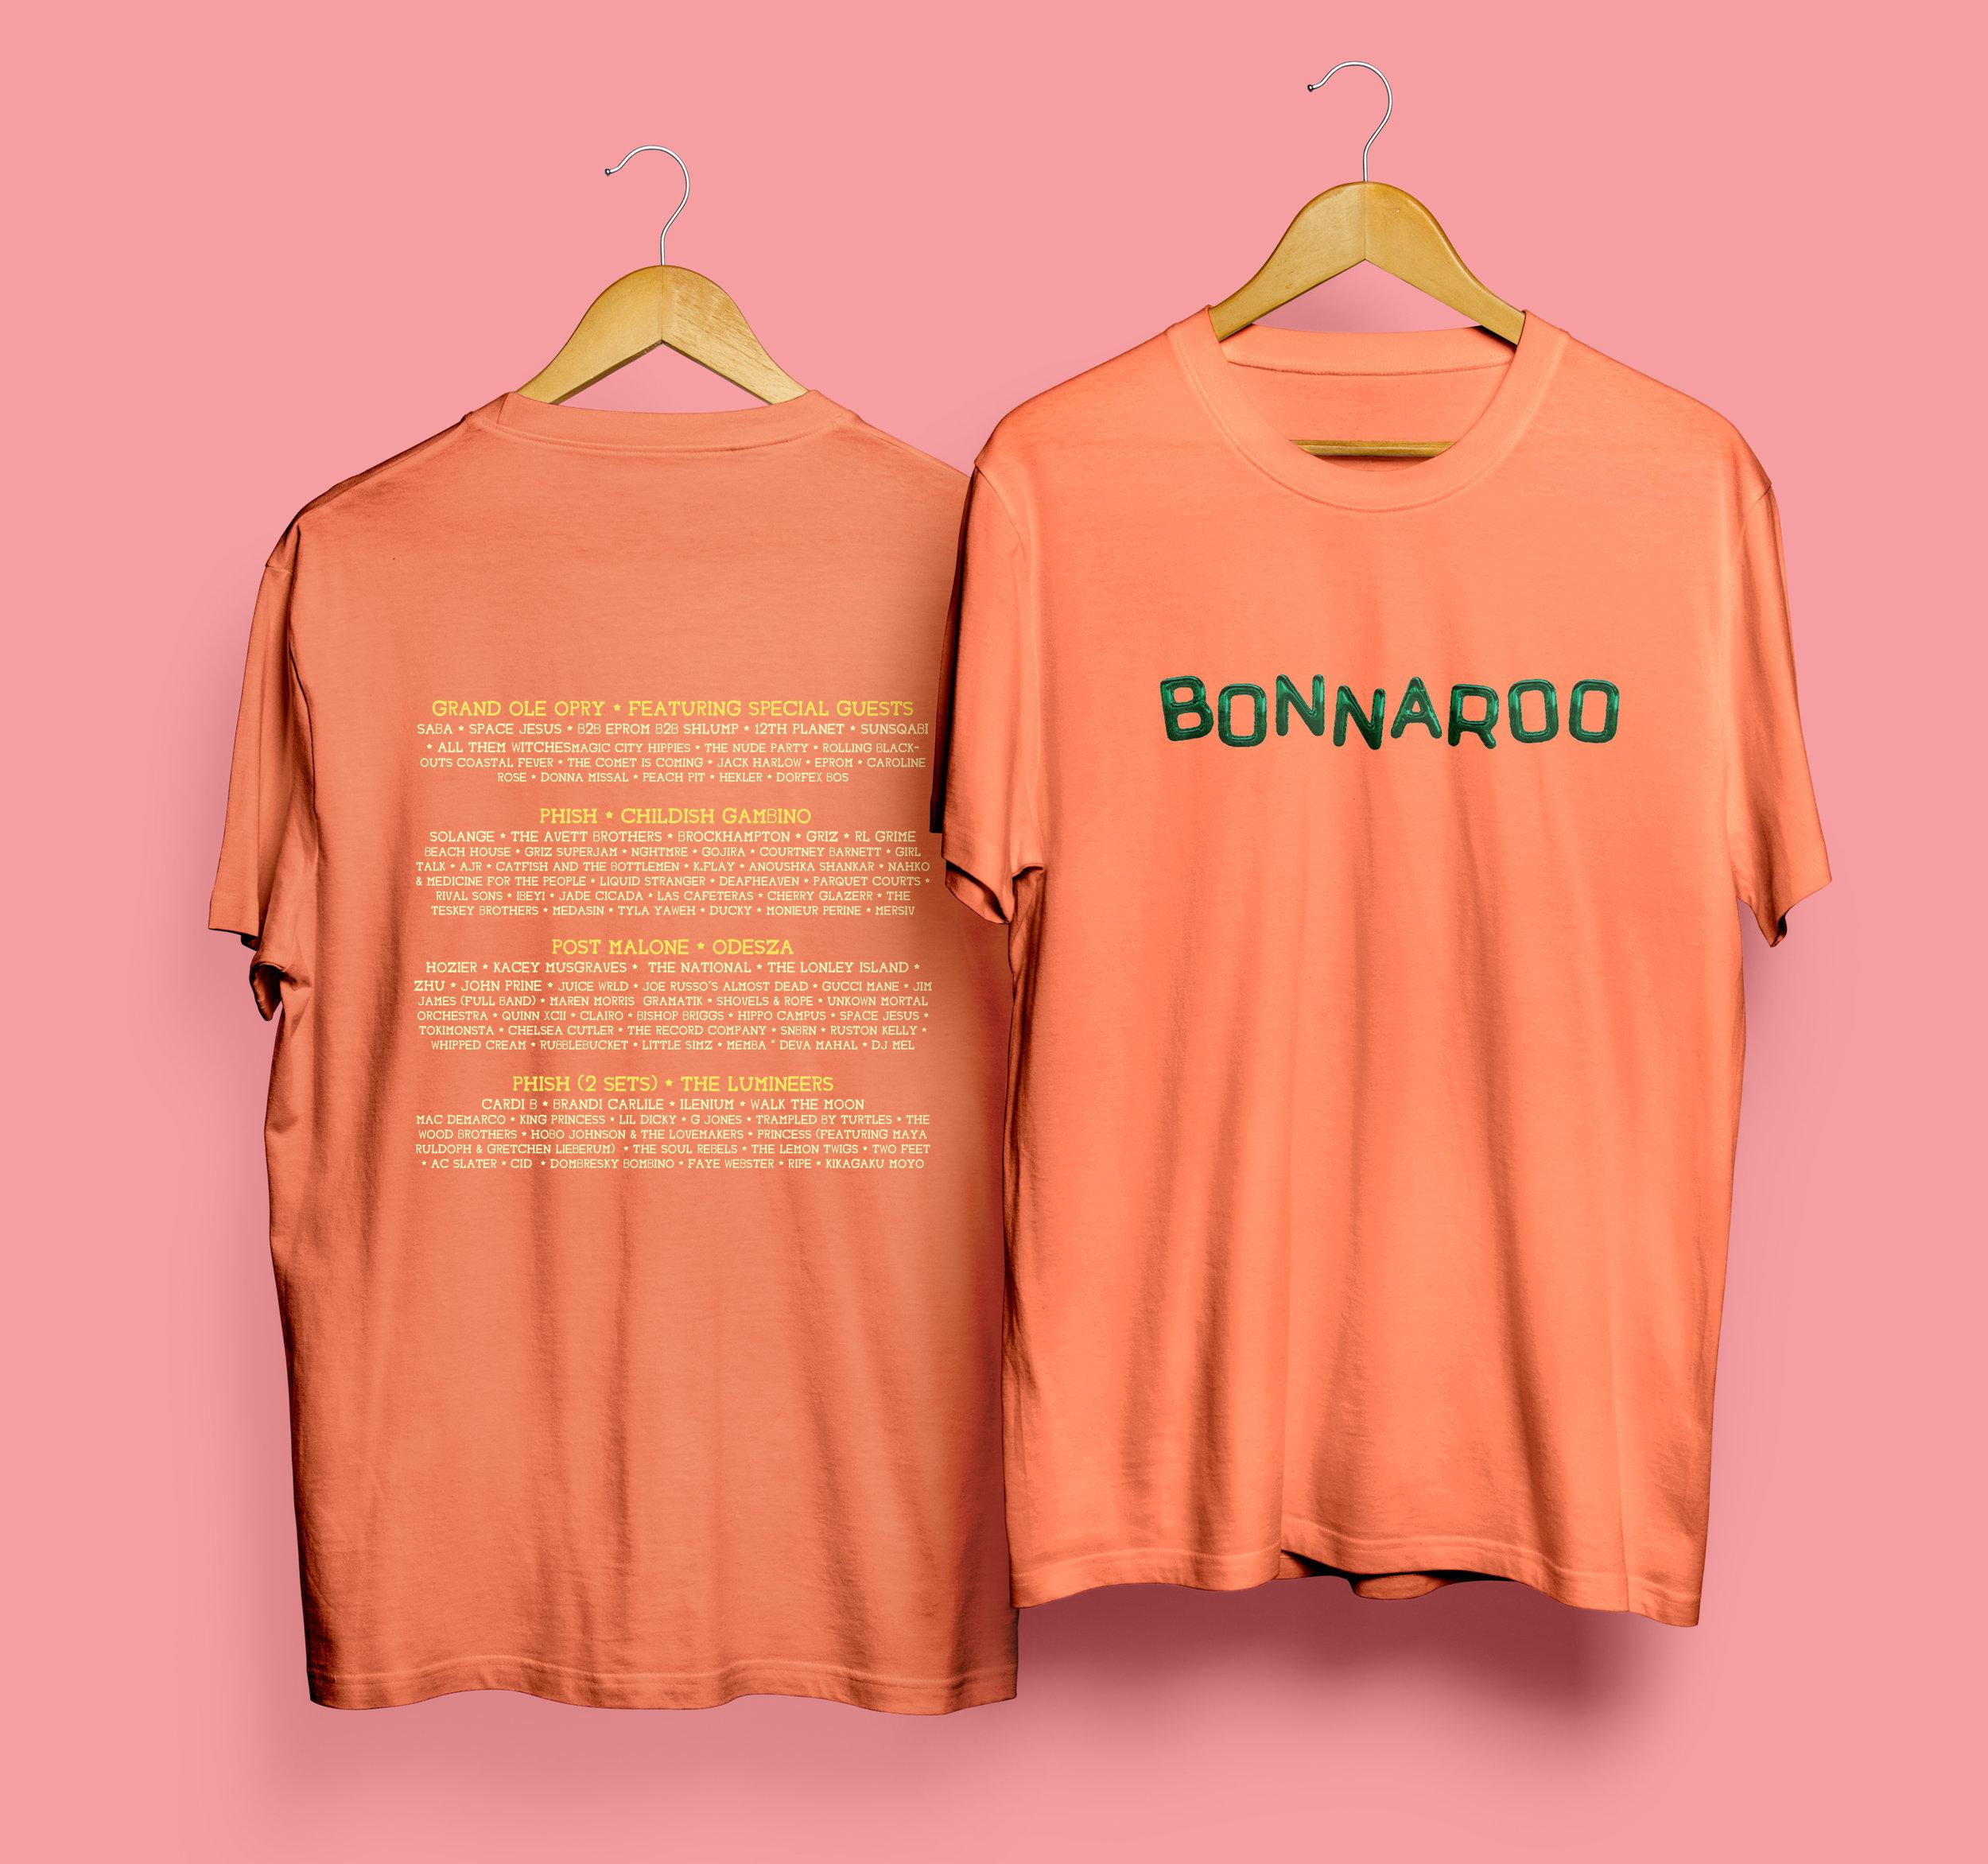 bonaroo_shirt_2.jpg